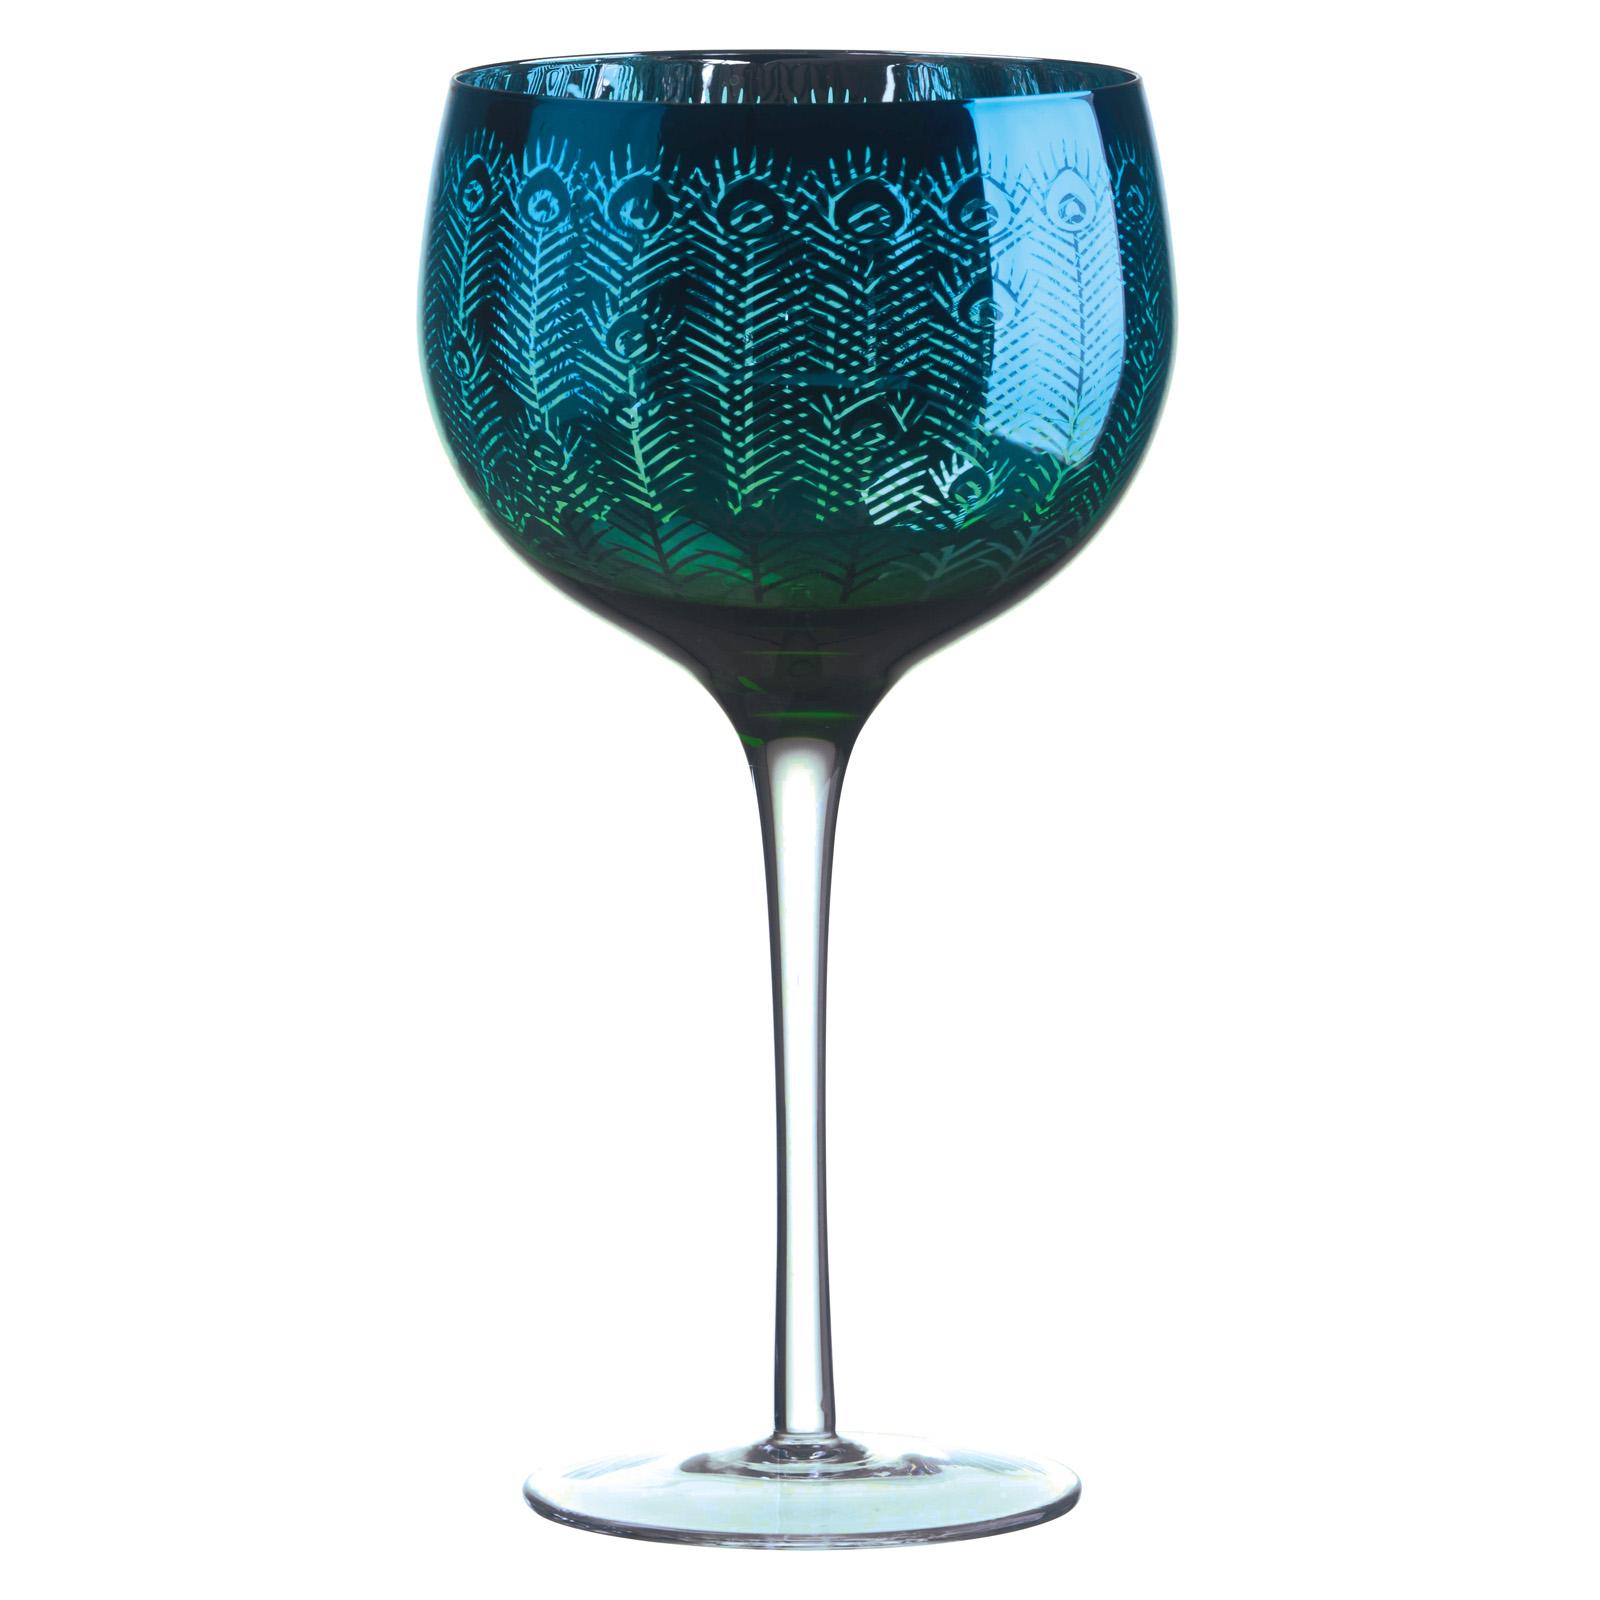 Set of 2 Peacock Gin Glasses